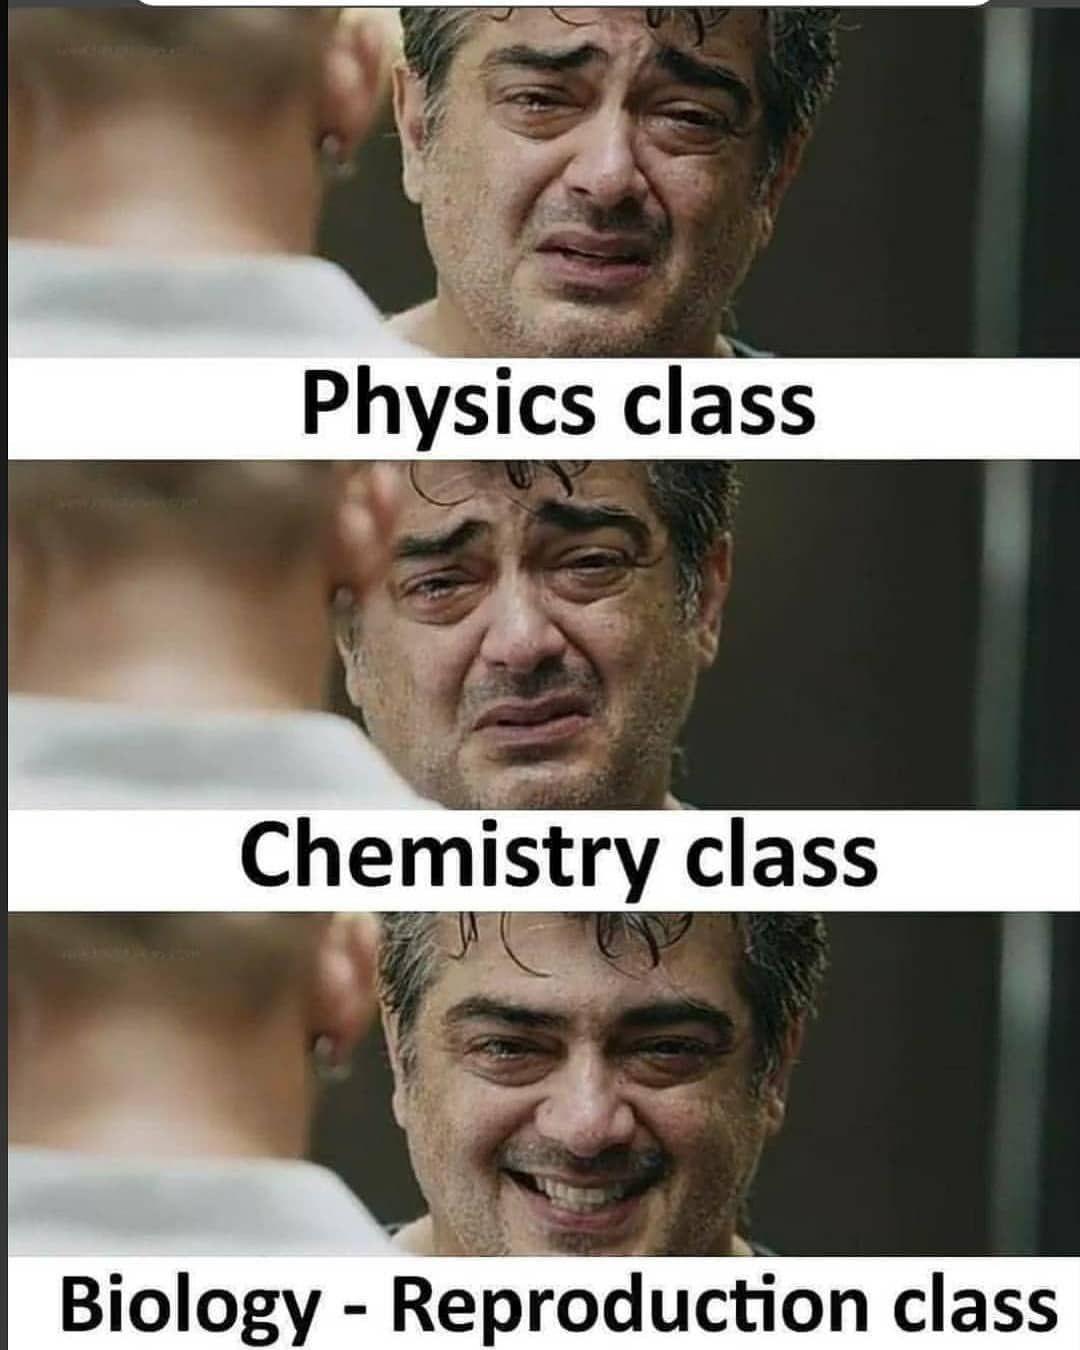 Pin By Mr X On Medical Memes Biology Memes Chemistry Jokes Engineering Memes